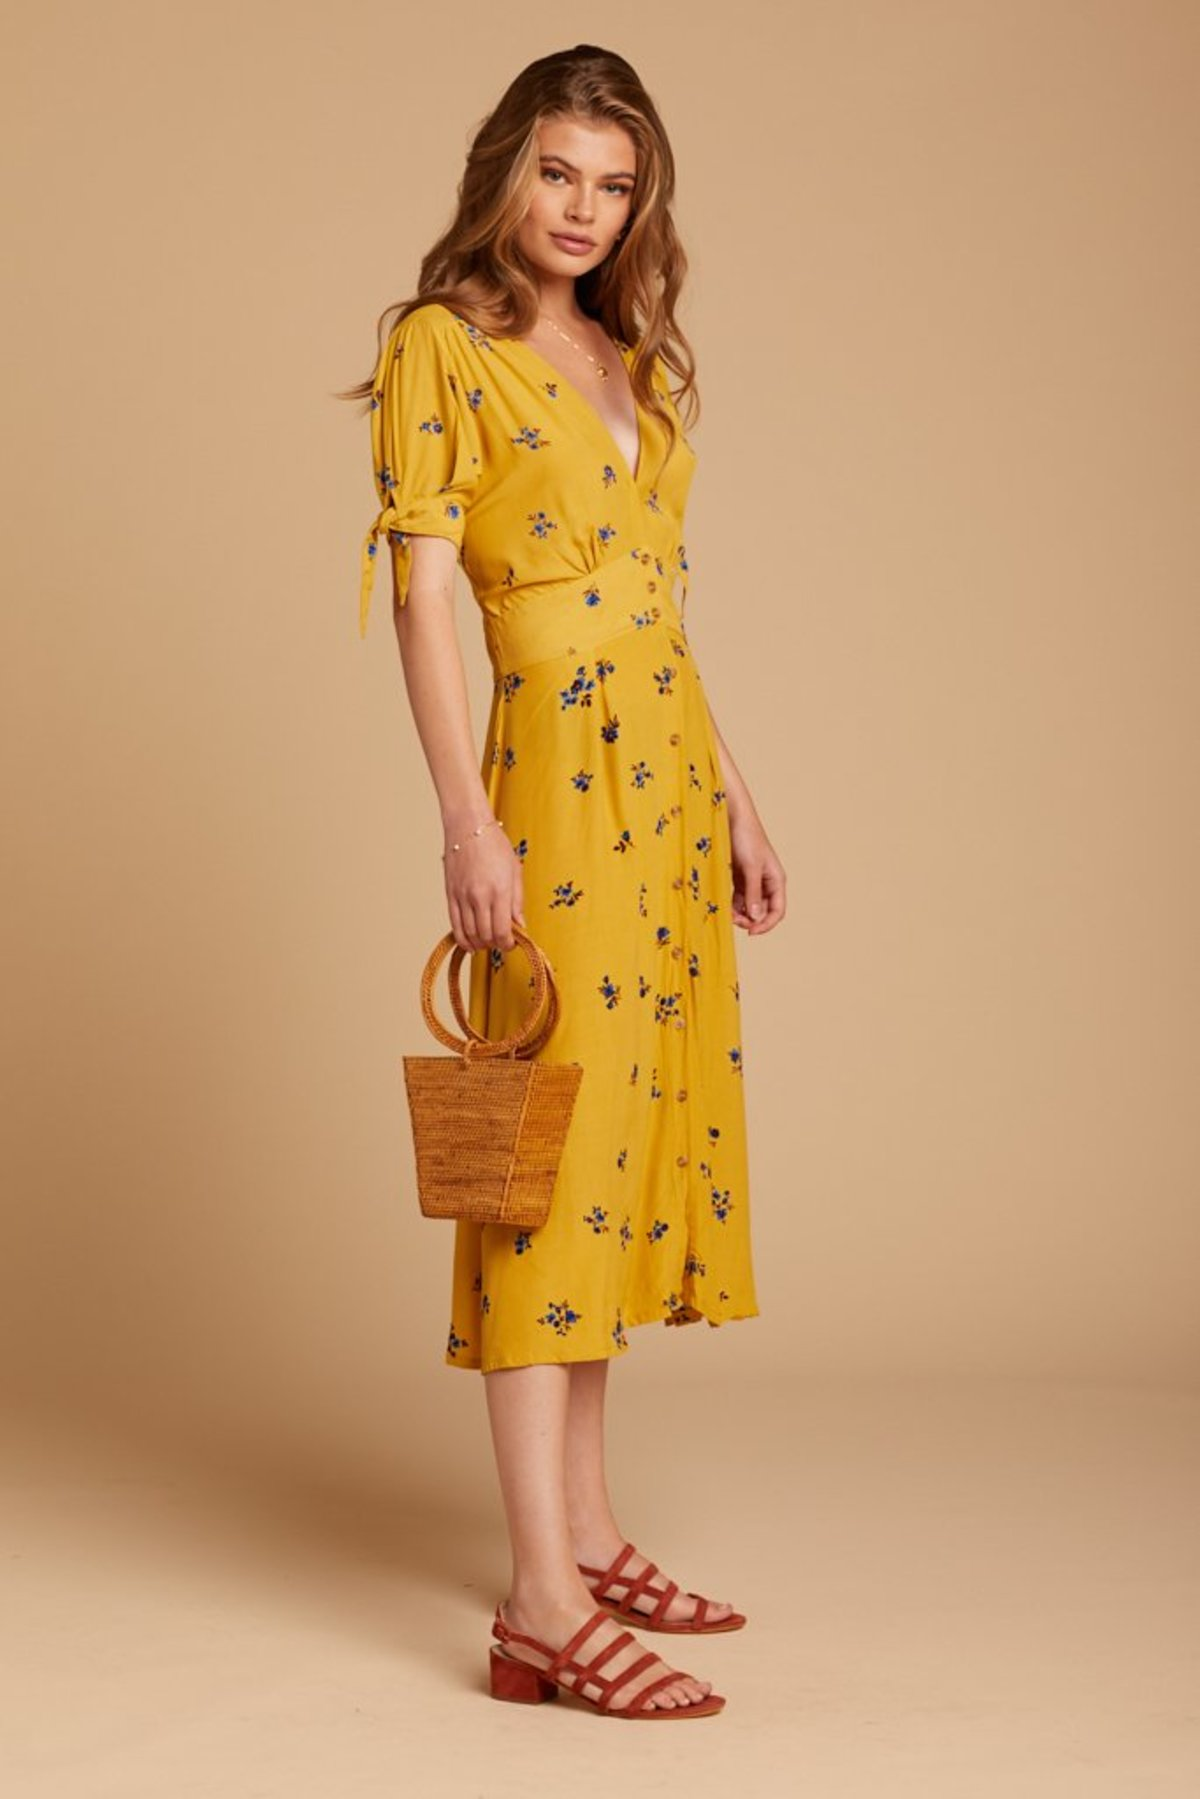 efb1905de5b4 Faithfull The Brand Billie Dress - Dolores Floral | Garmentory